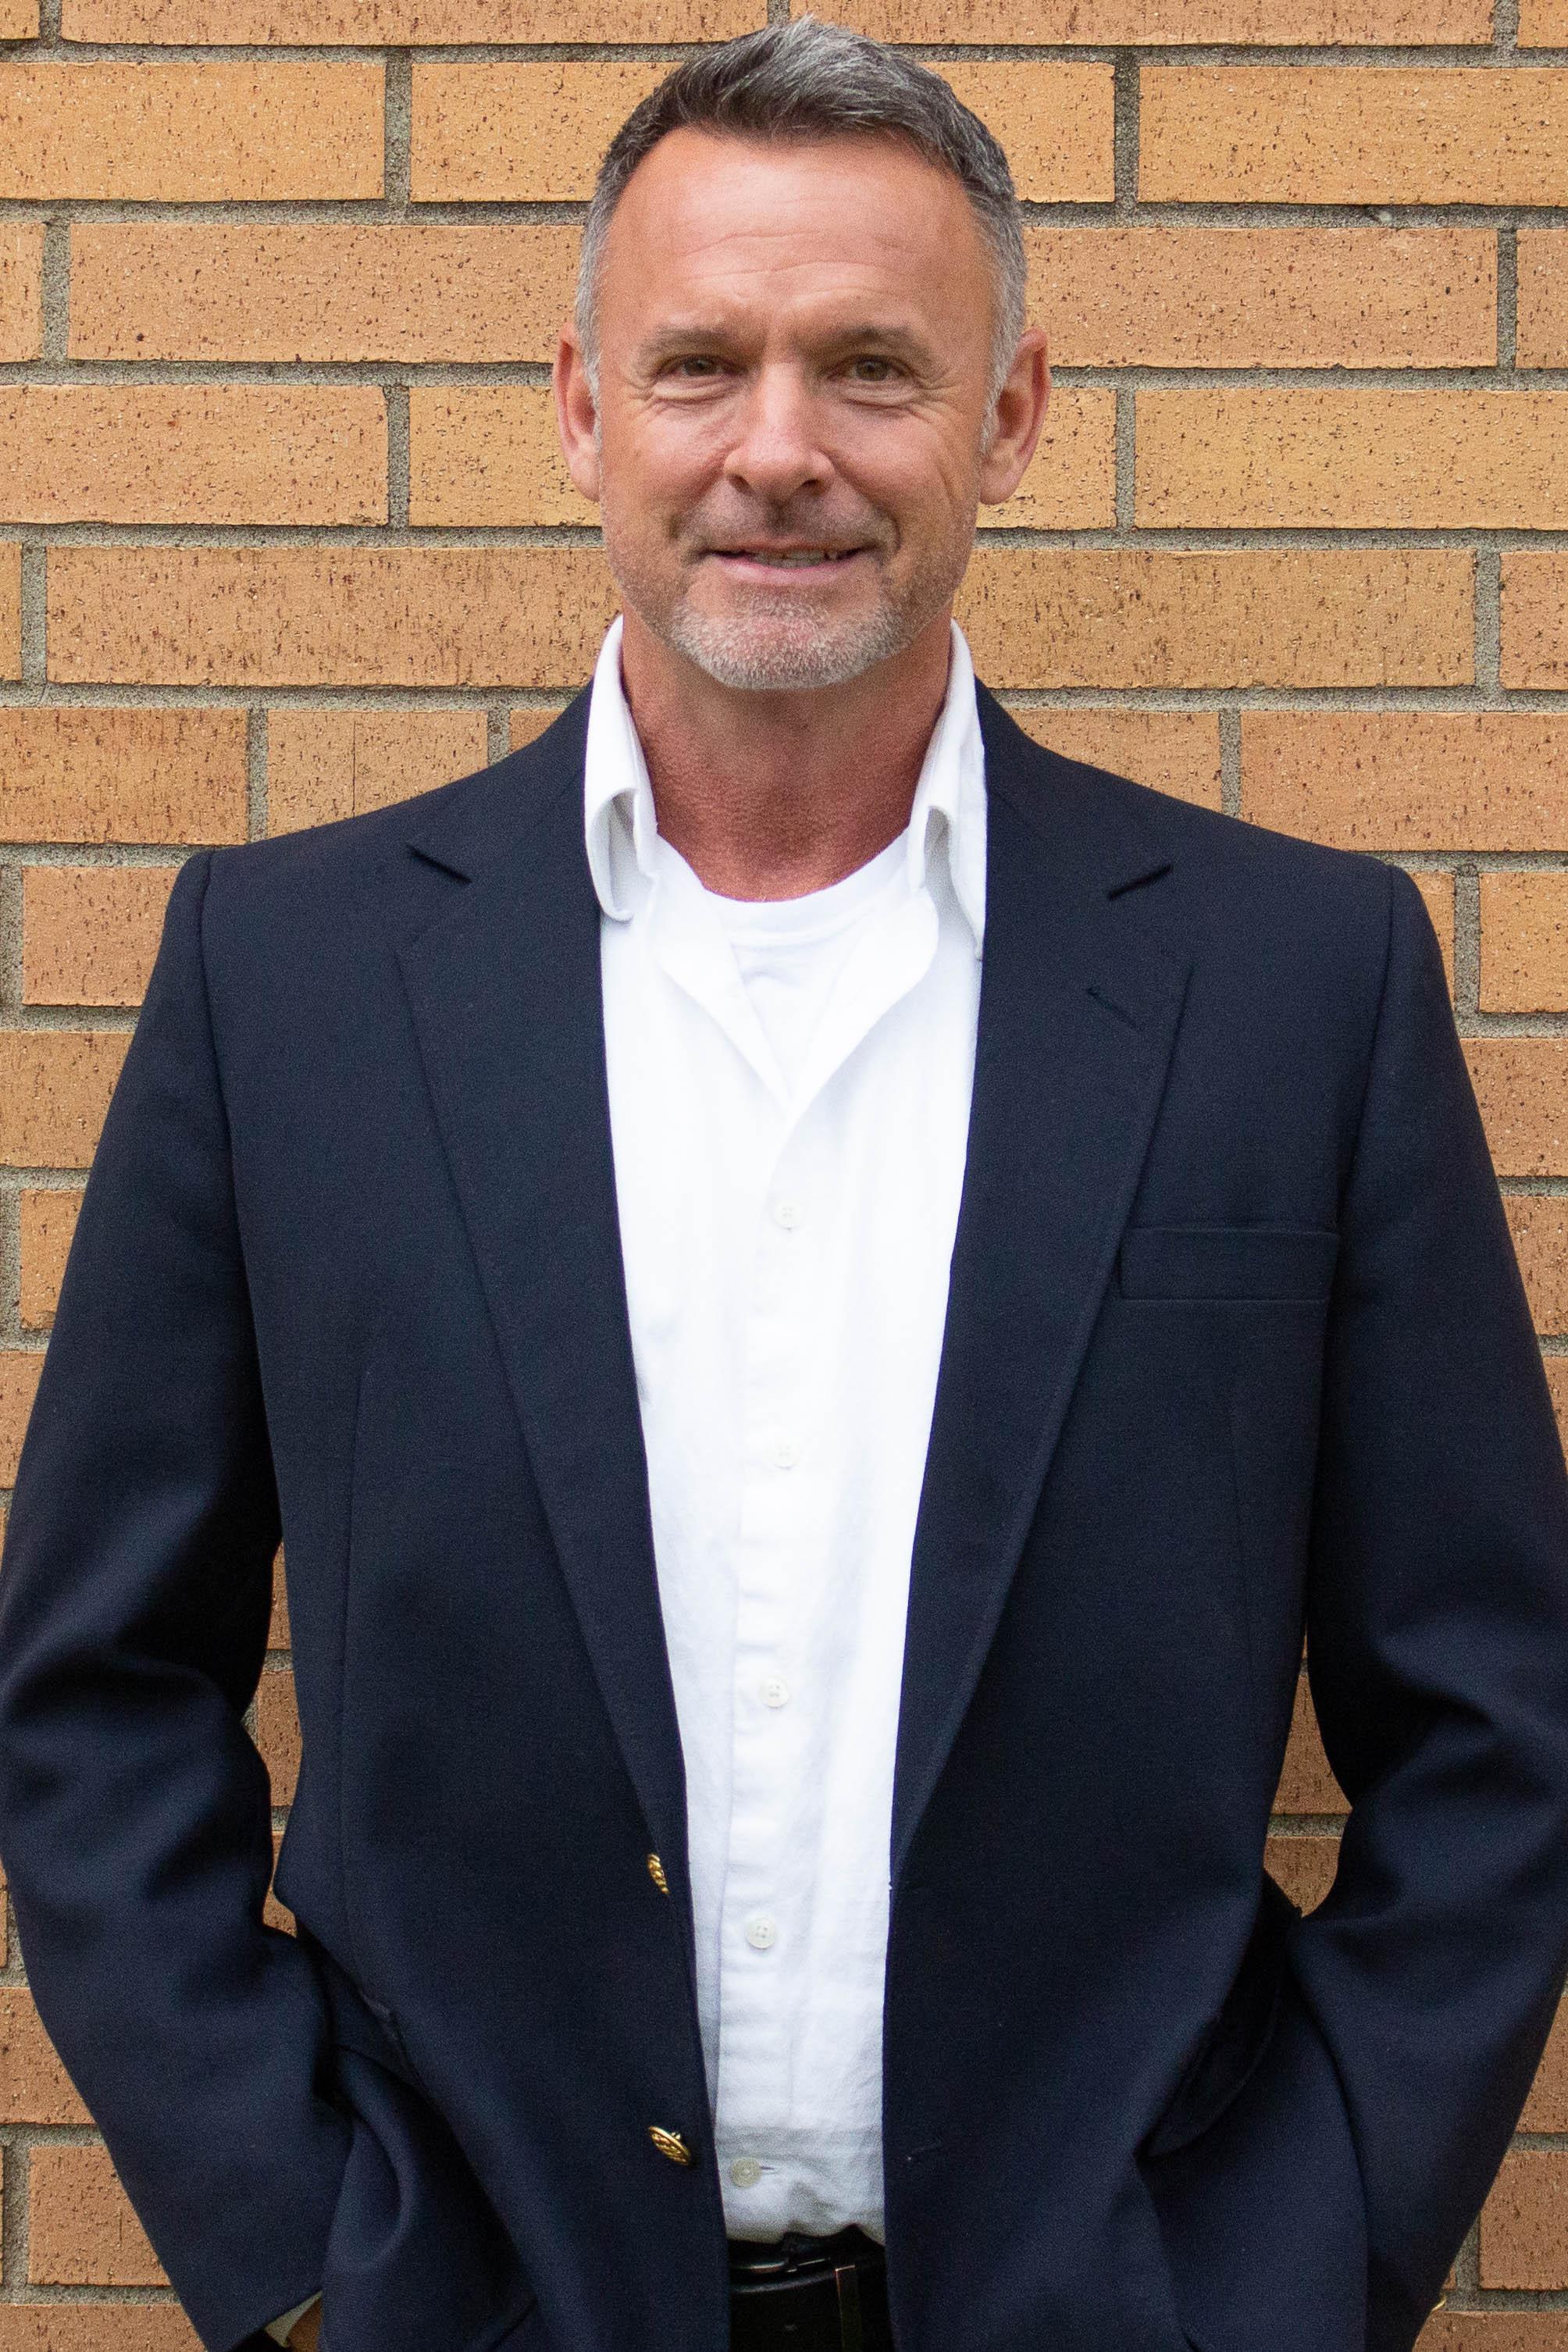 Craig Trick, Secretary - Email: craig@constructionsolution.usVisit: Comprehensive Construction Solutions